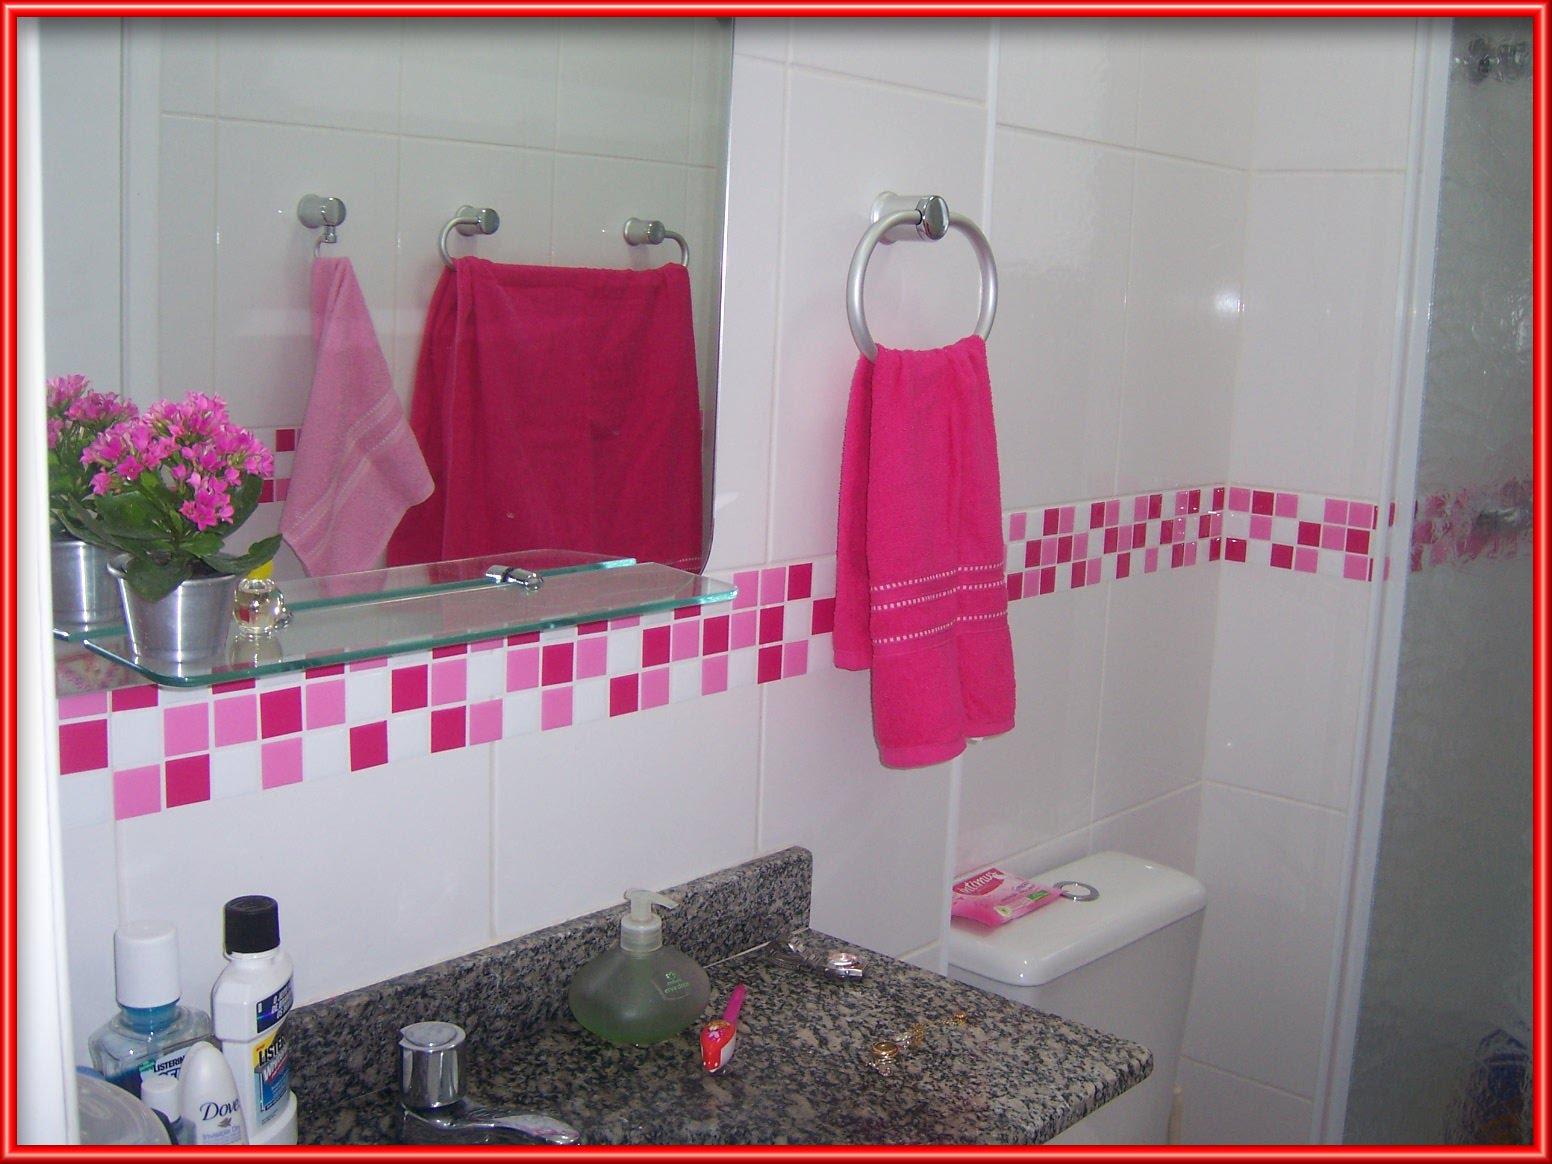 Pastilhas Adesivas #B91214 1552x1164 Banheiro Com Pastilhas Adesivas